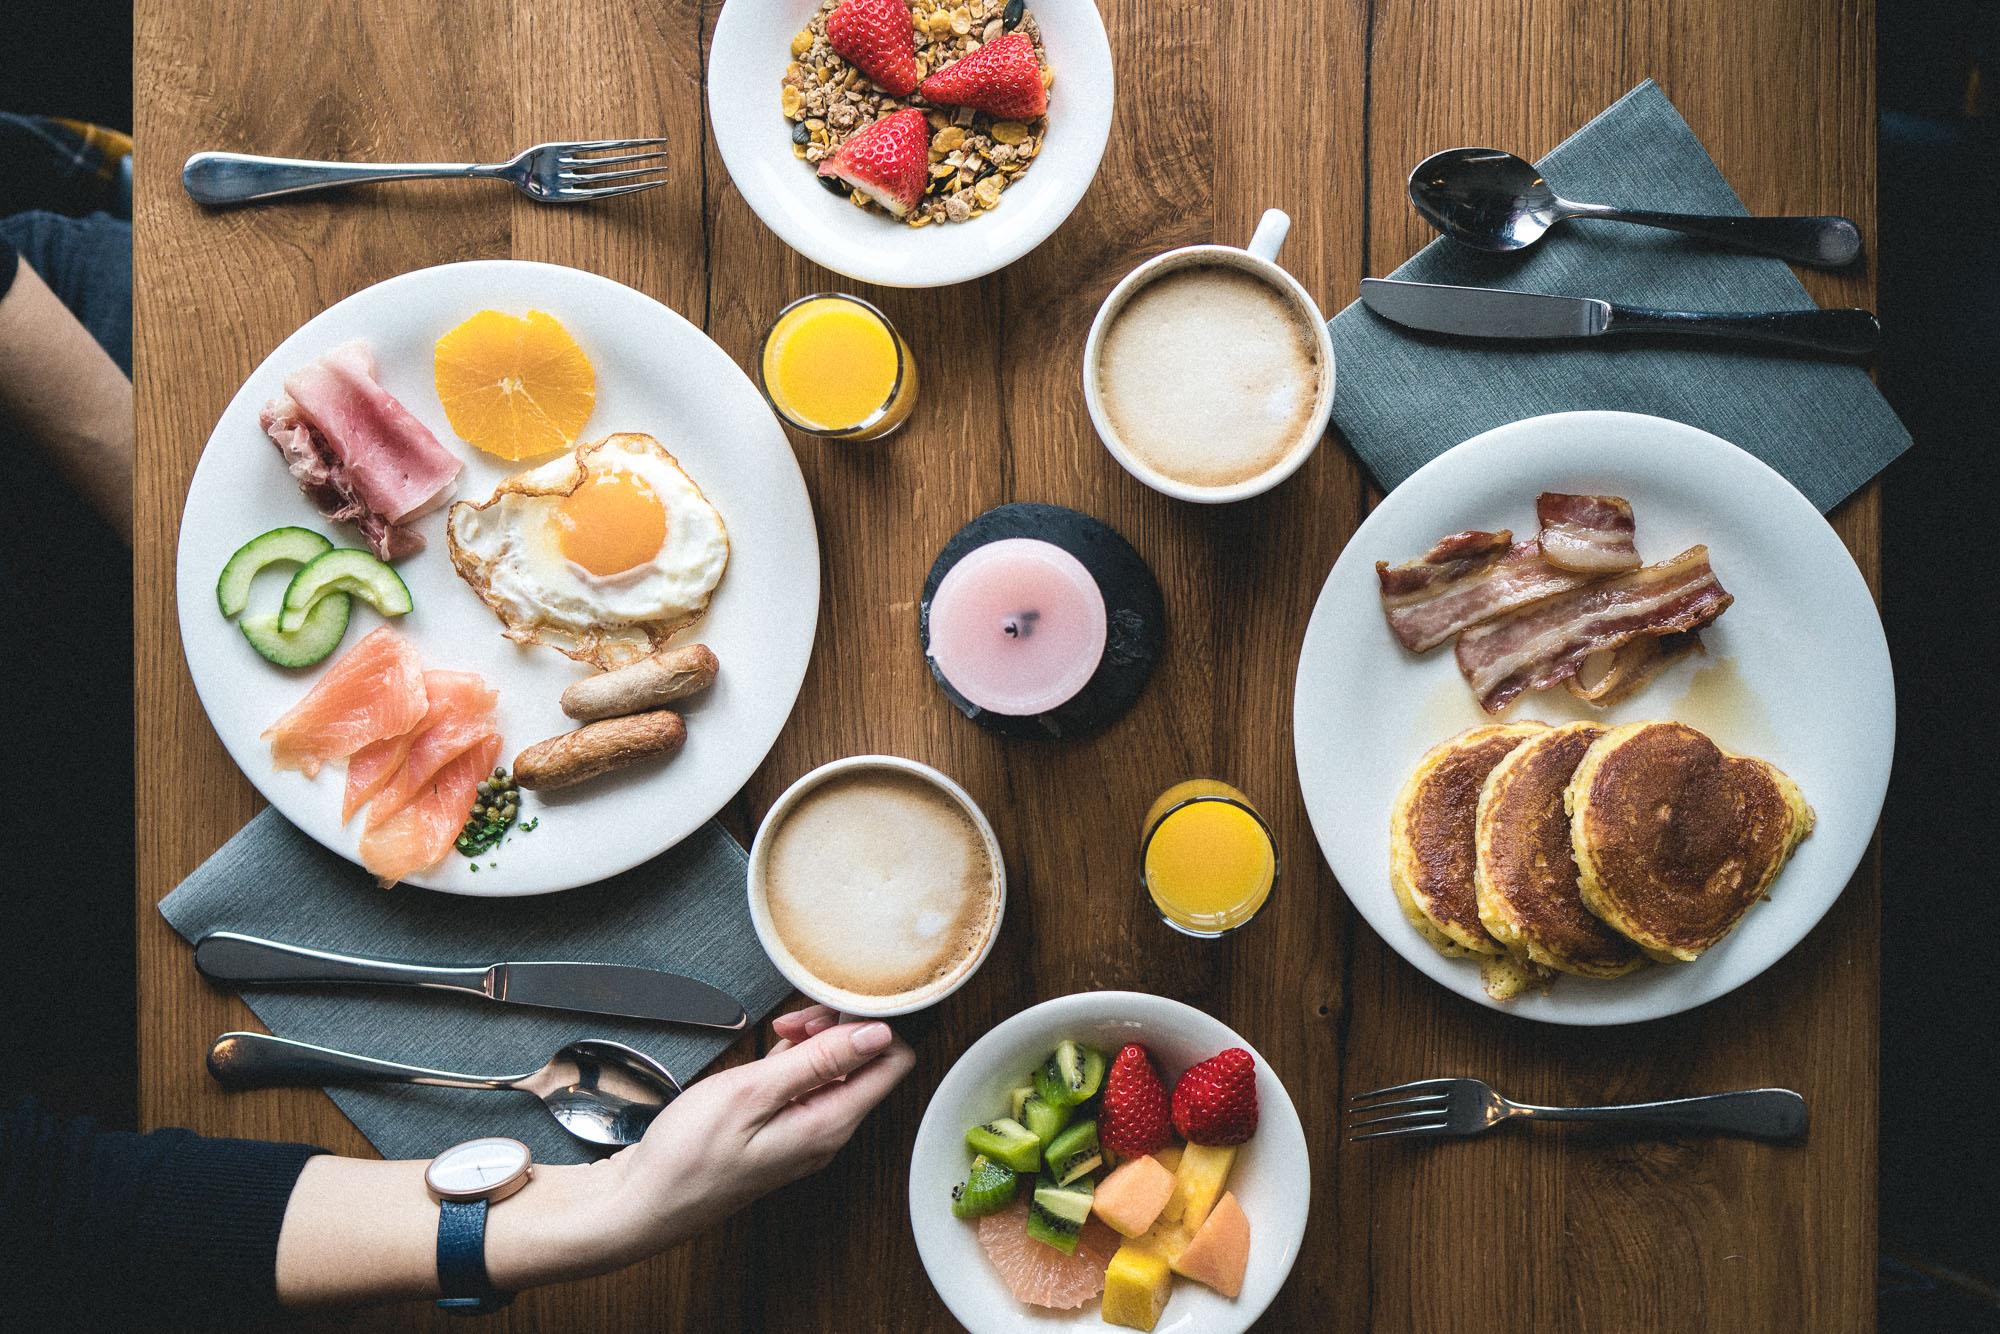 Breakfast Spread at Huus Gstaad Switzerland, A Swiss Hotel